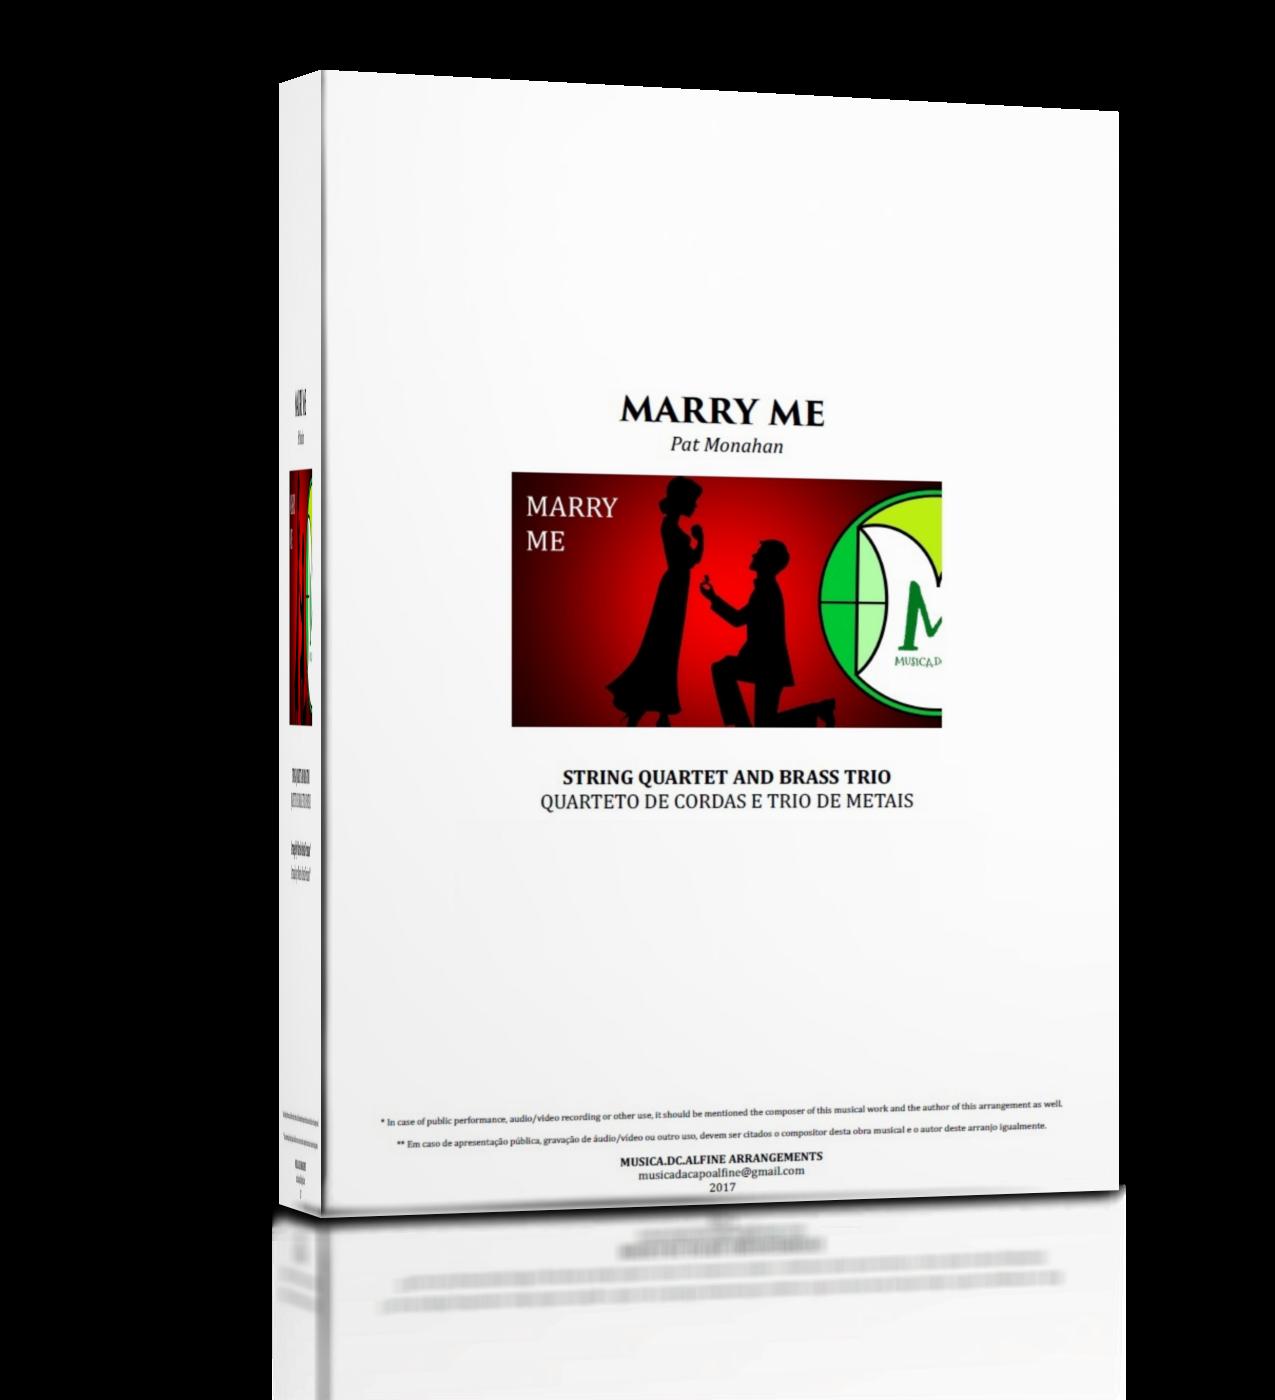 MUSICA.DC.ALFINE ARRANGEMENTS: Marry Me | Train | String ...